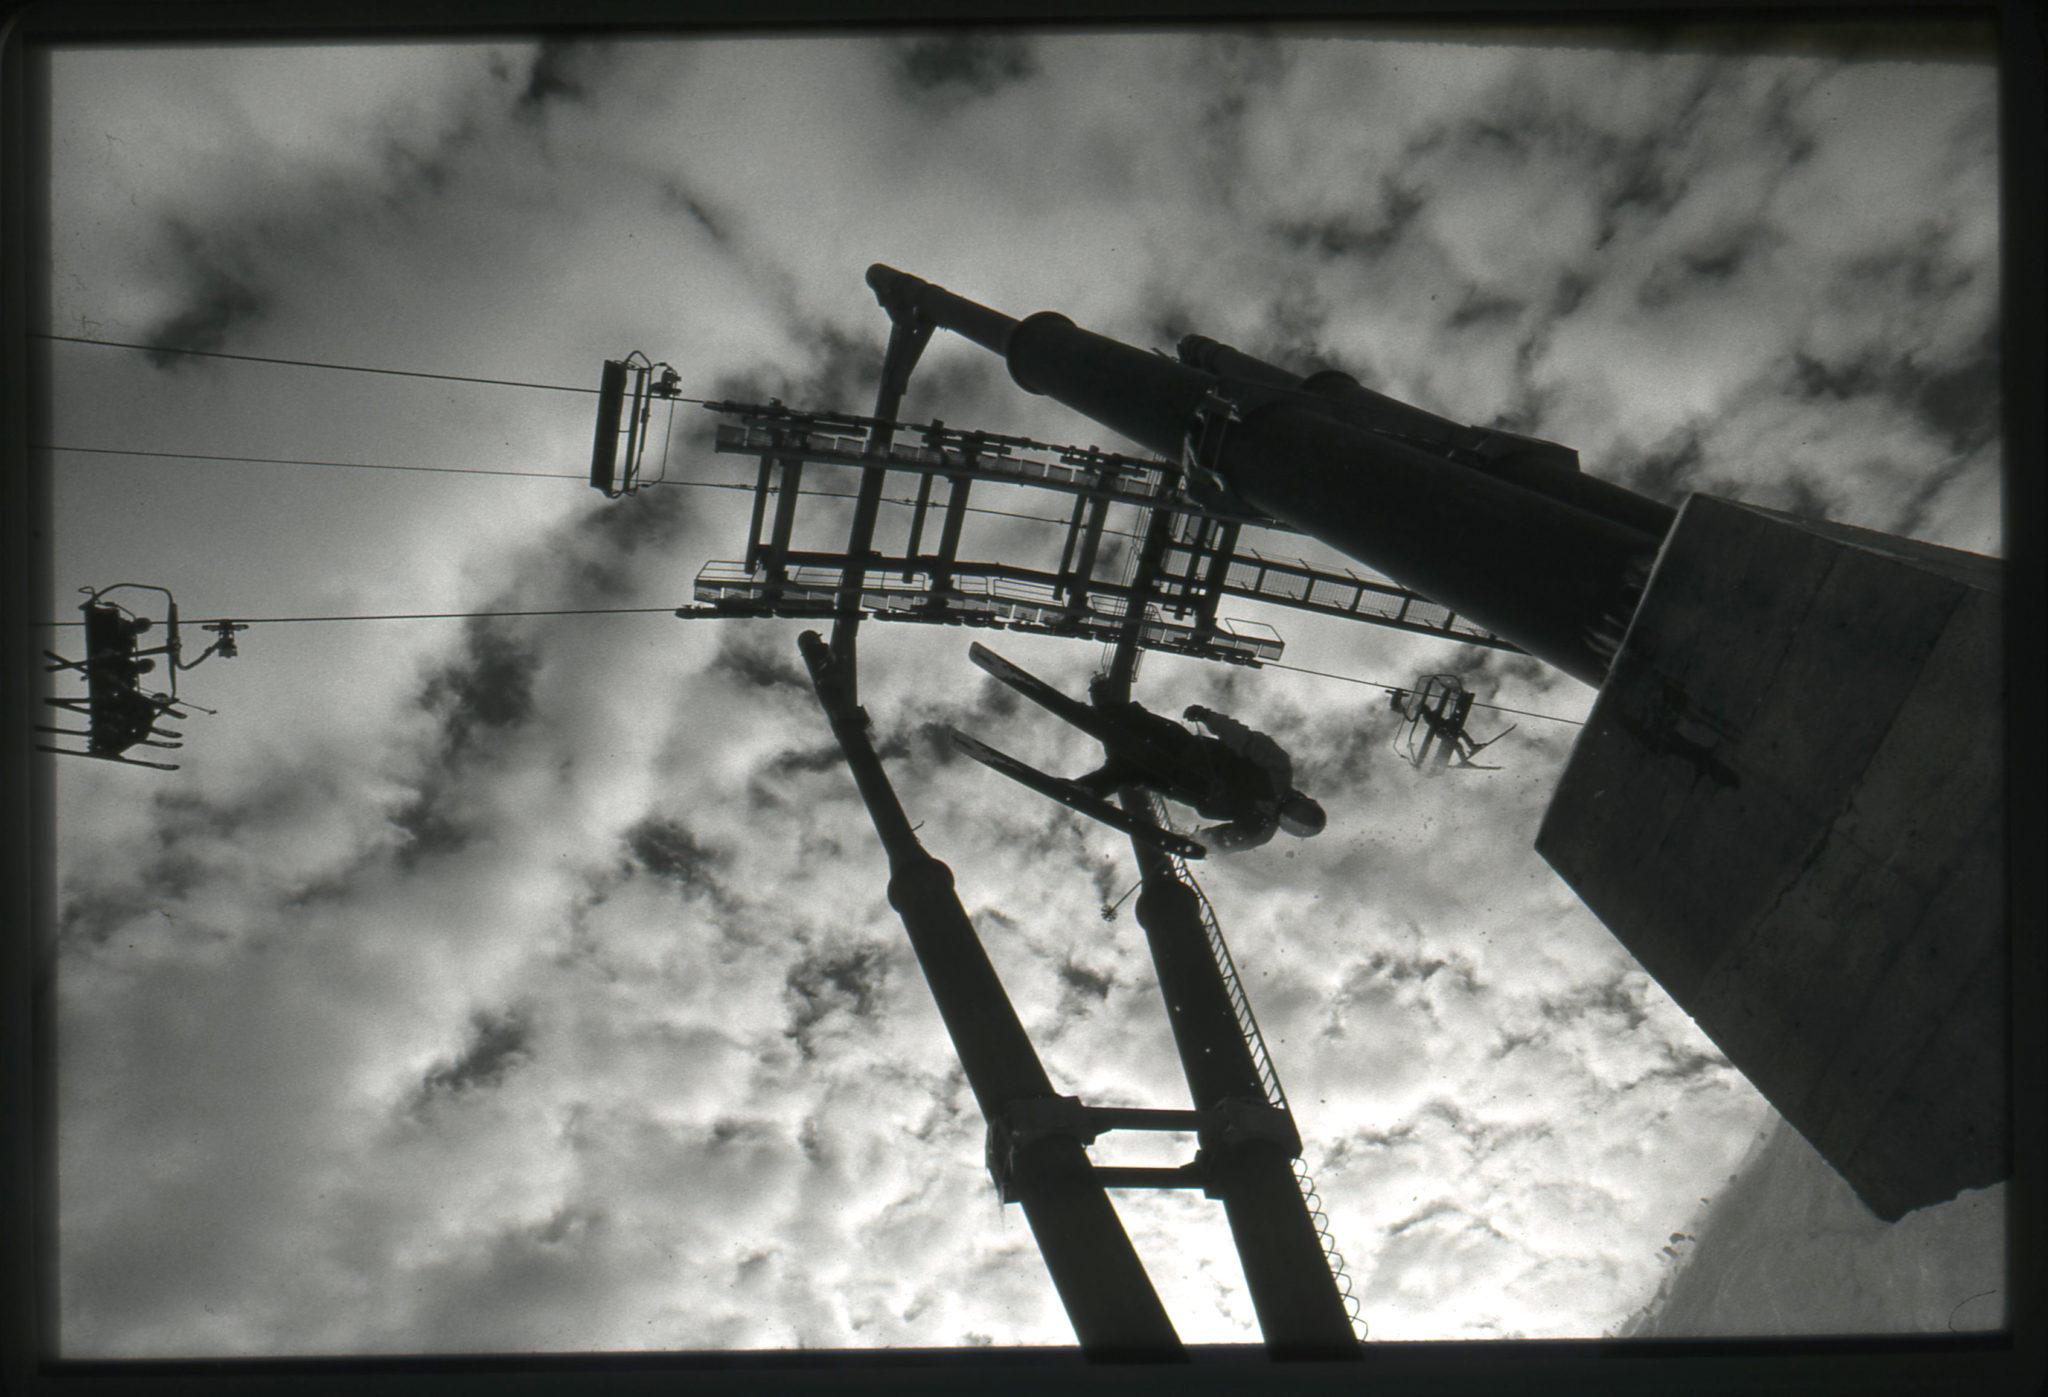 Shane McConkey airing off Siberia Chair tower footing, December 2003. Photo: Scott Gaffney